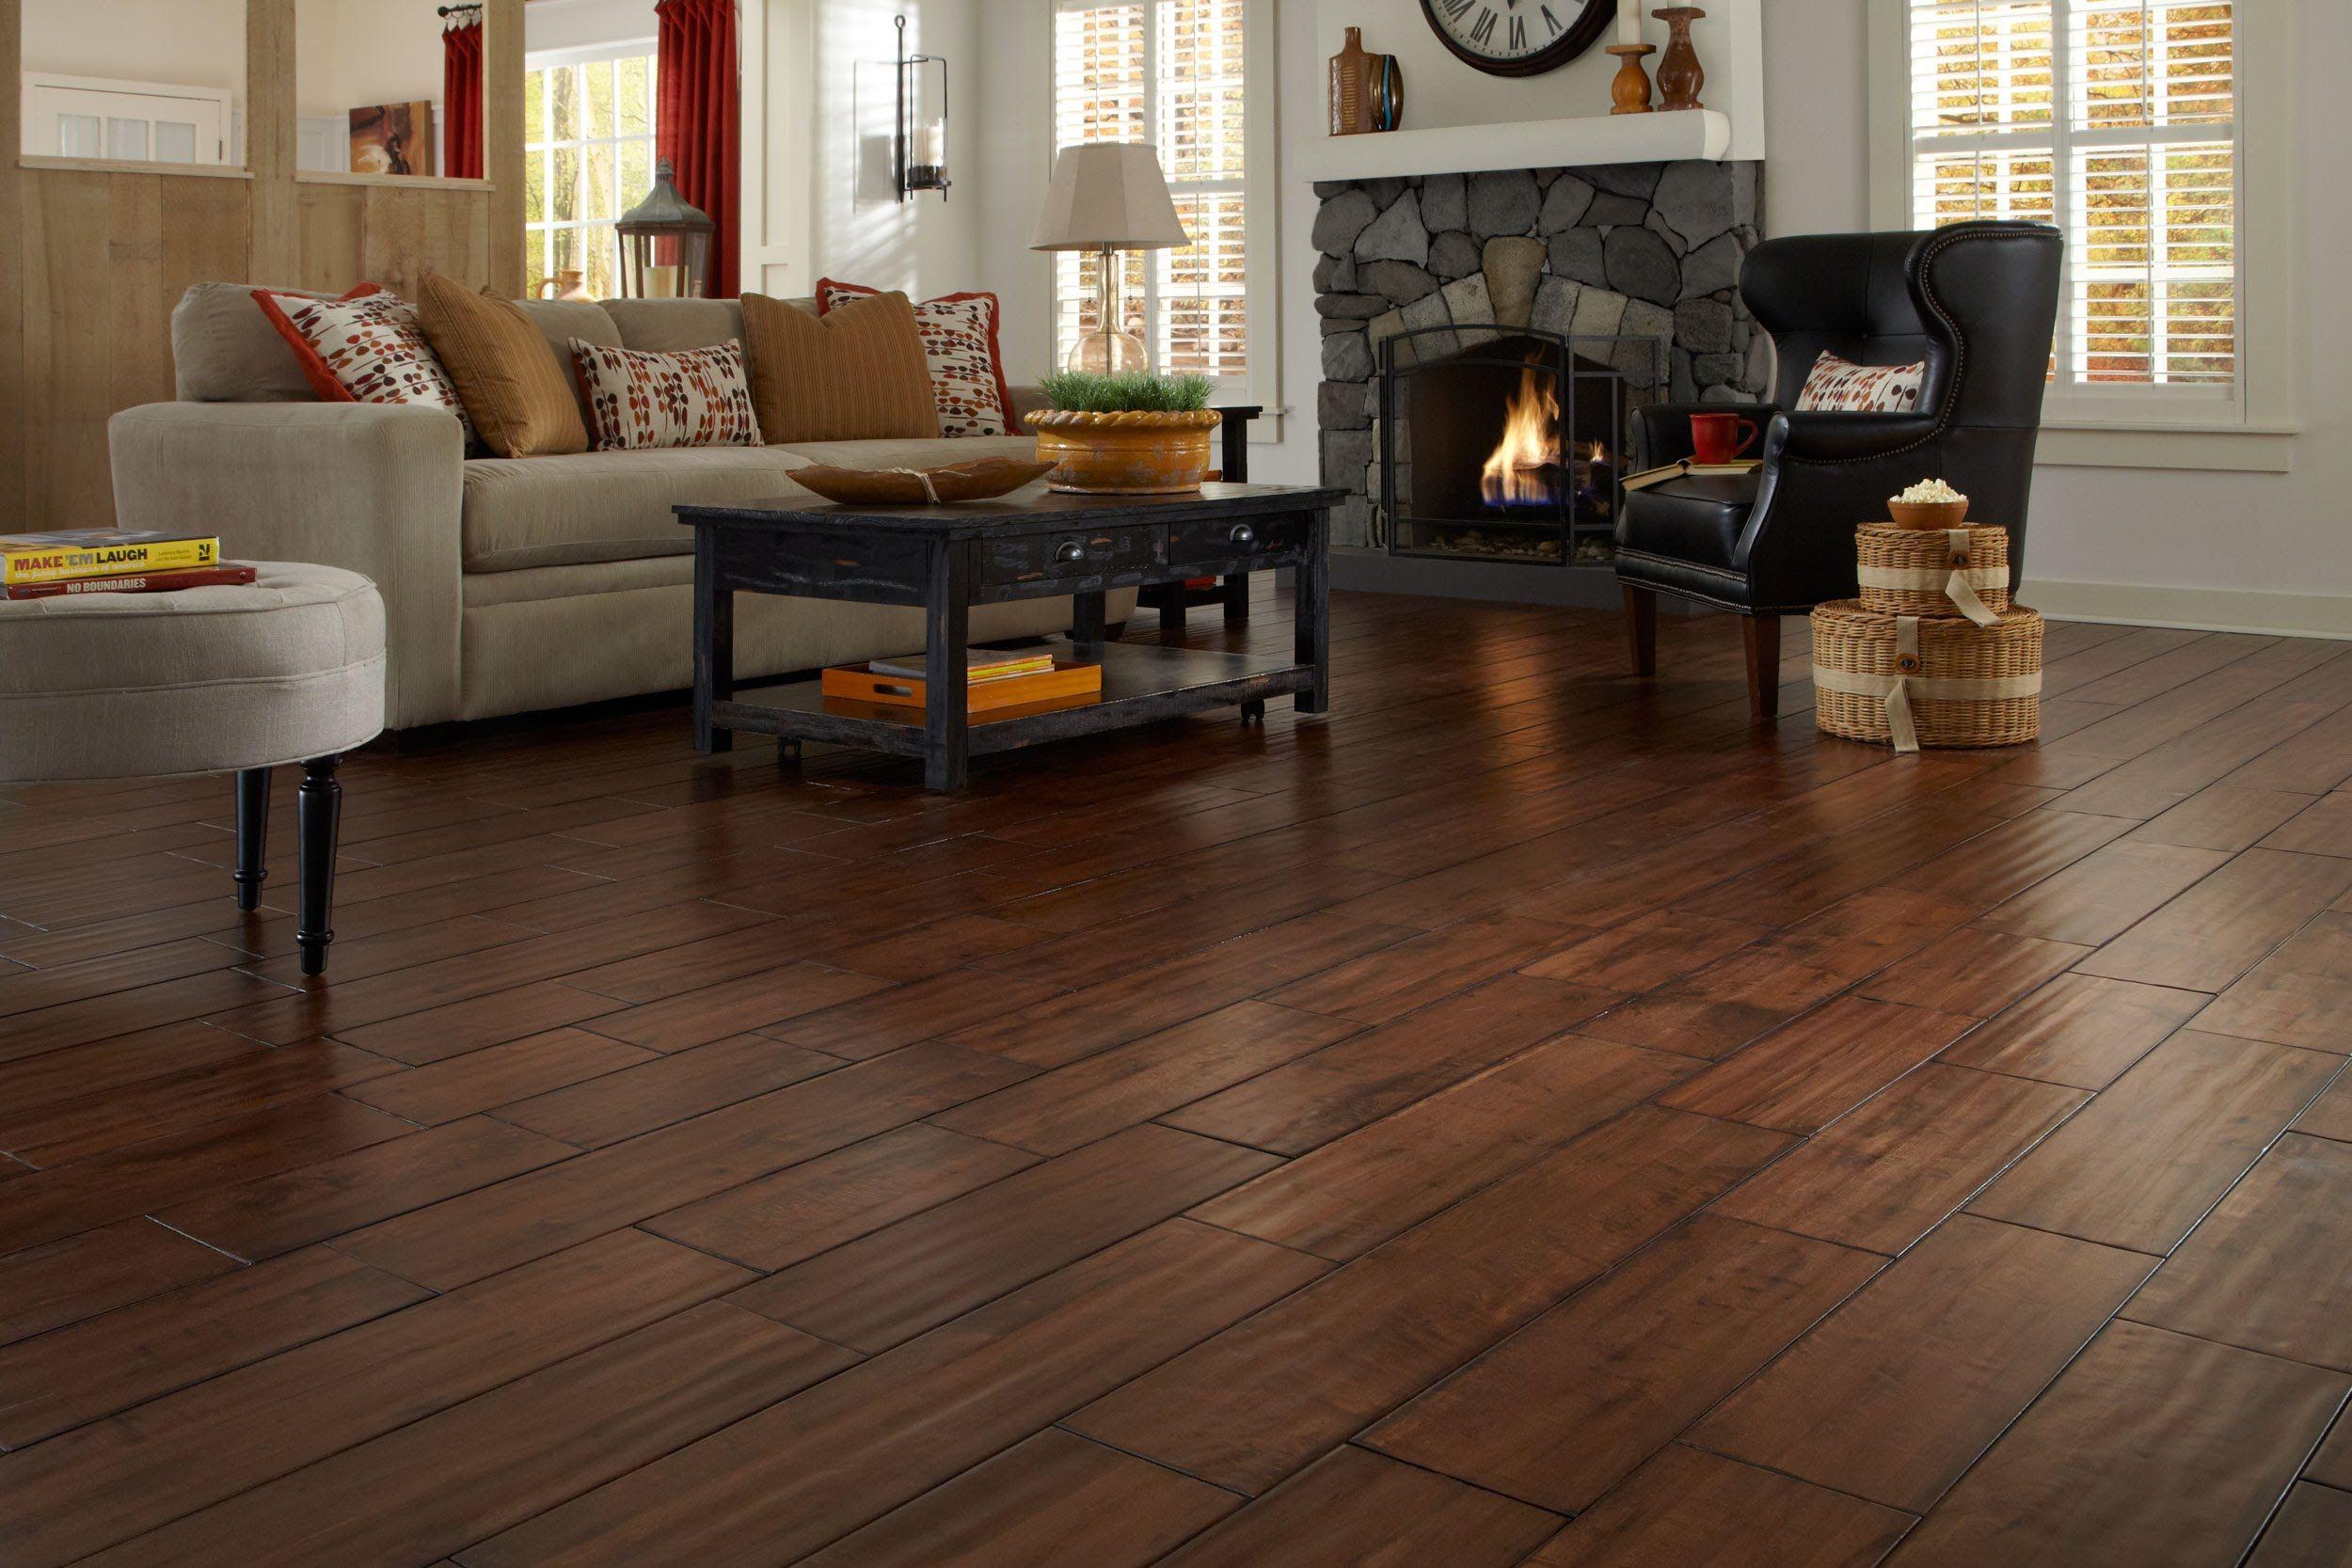 Pin By Marianna Patsfall On Basement Distressed Hardwood Floors